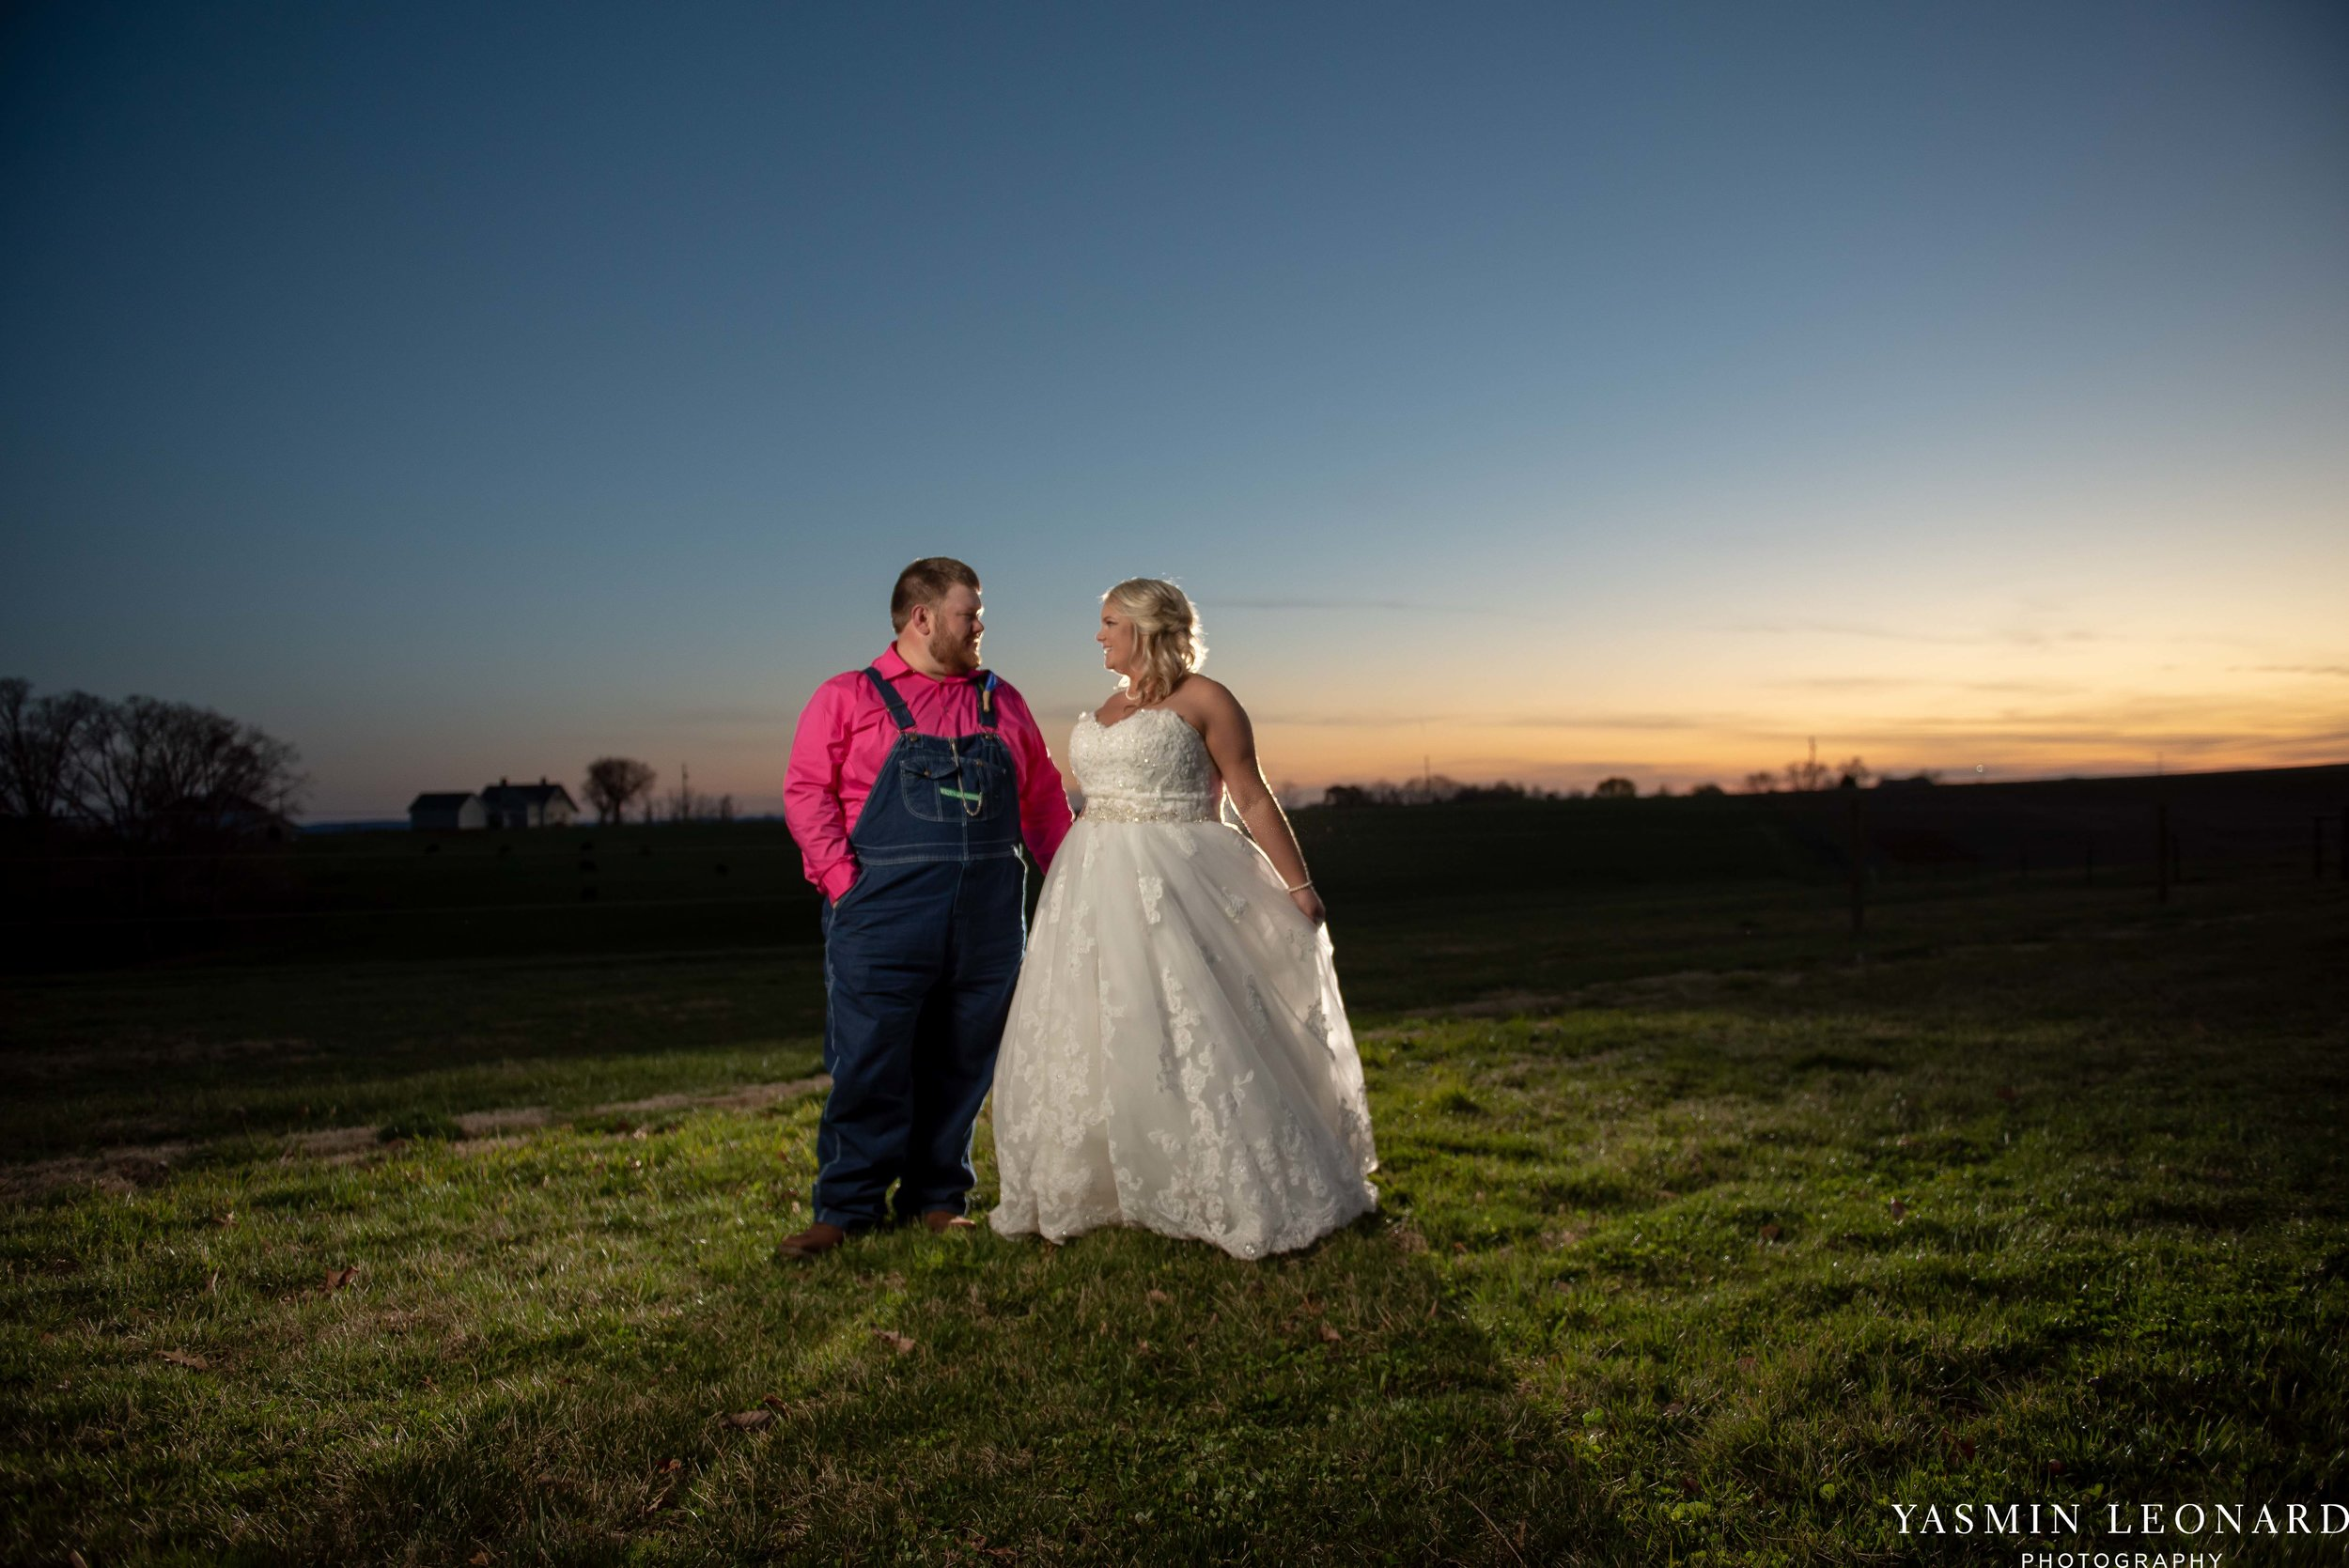 The Barn at Heritage Farm - Country Wedding - Pink and Blue Wedding - Barn Wedding - Outdoor Wedding - Cotton and Wheat Decor - Groom in Bibs - Pink Bridal Colors - Yasmin Leonard Photography-32.jpg